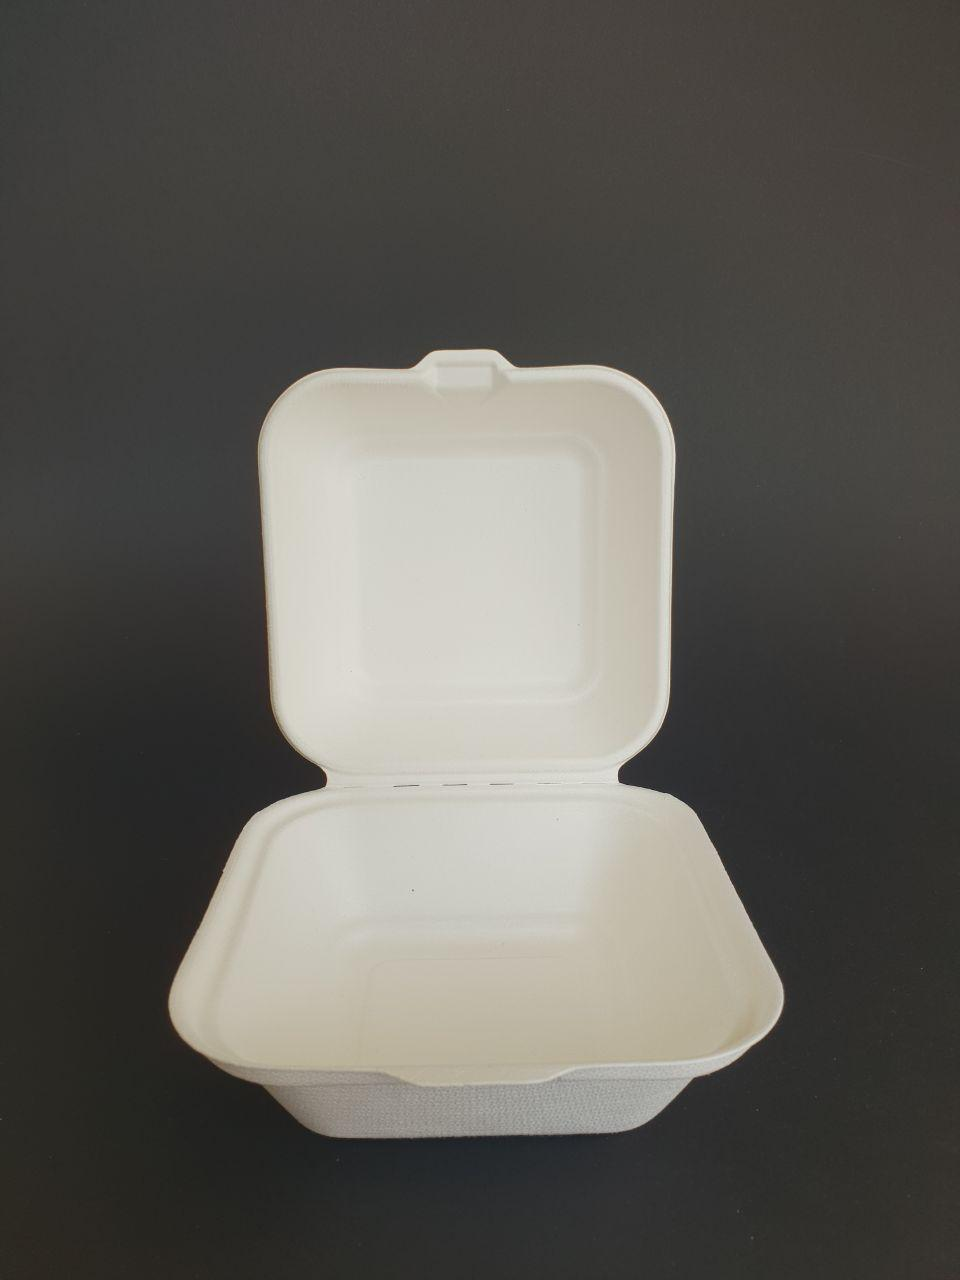 Упаковка из сахарного тростника 144.7*141*46.9/75.2 мм, 500 шт/ящ.